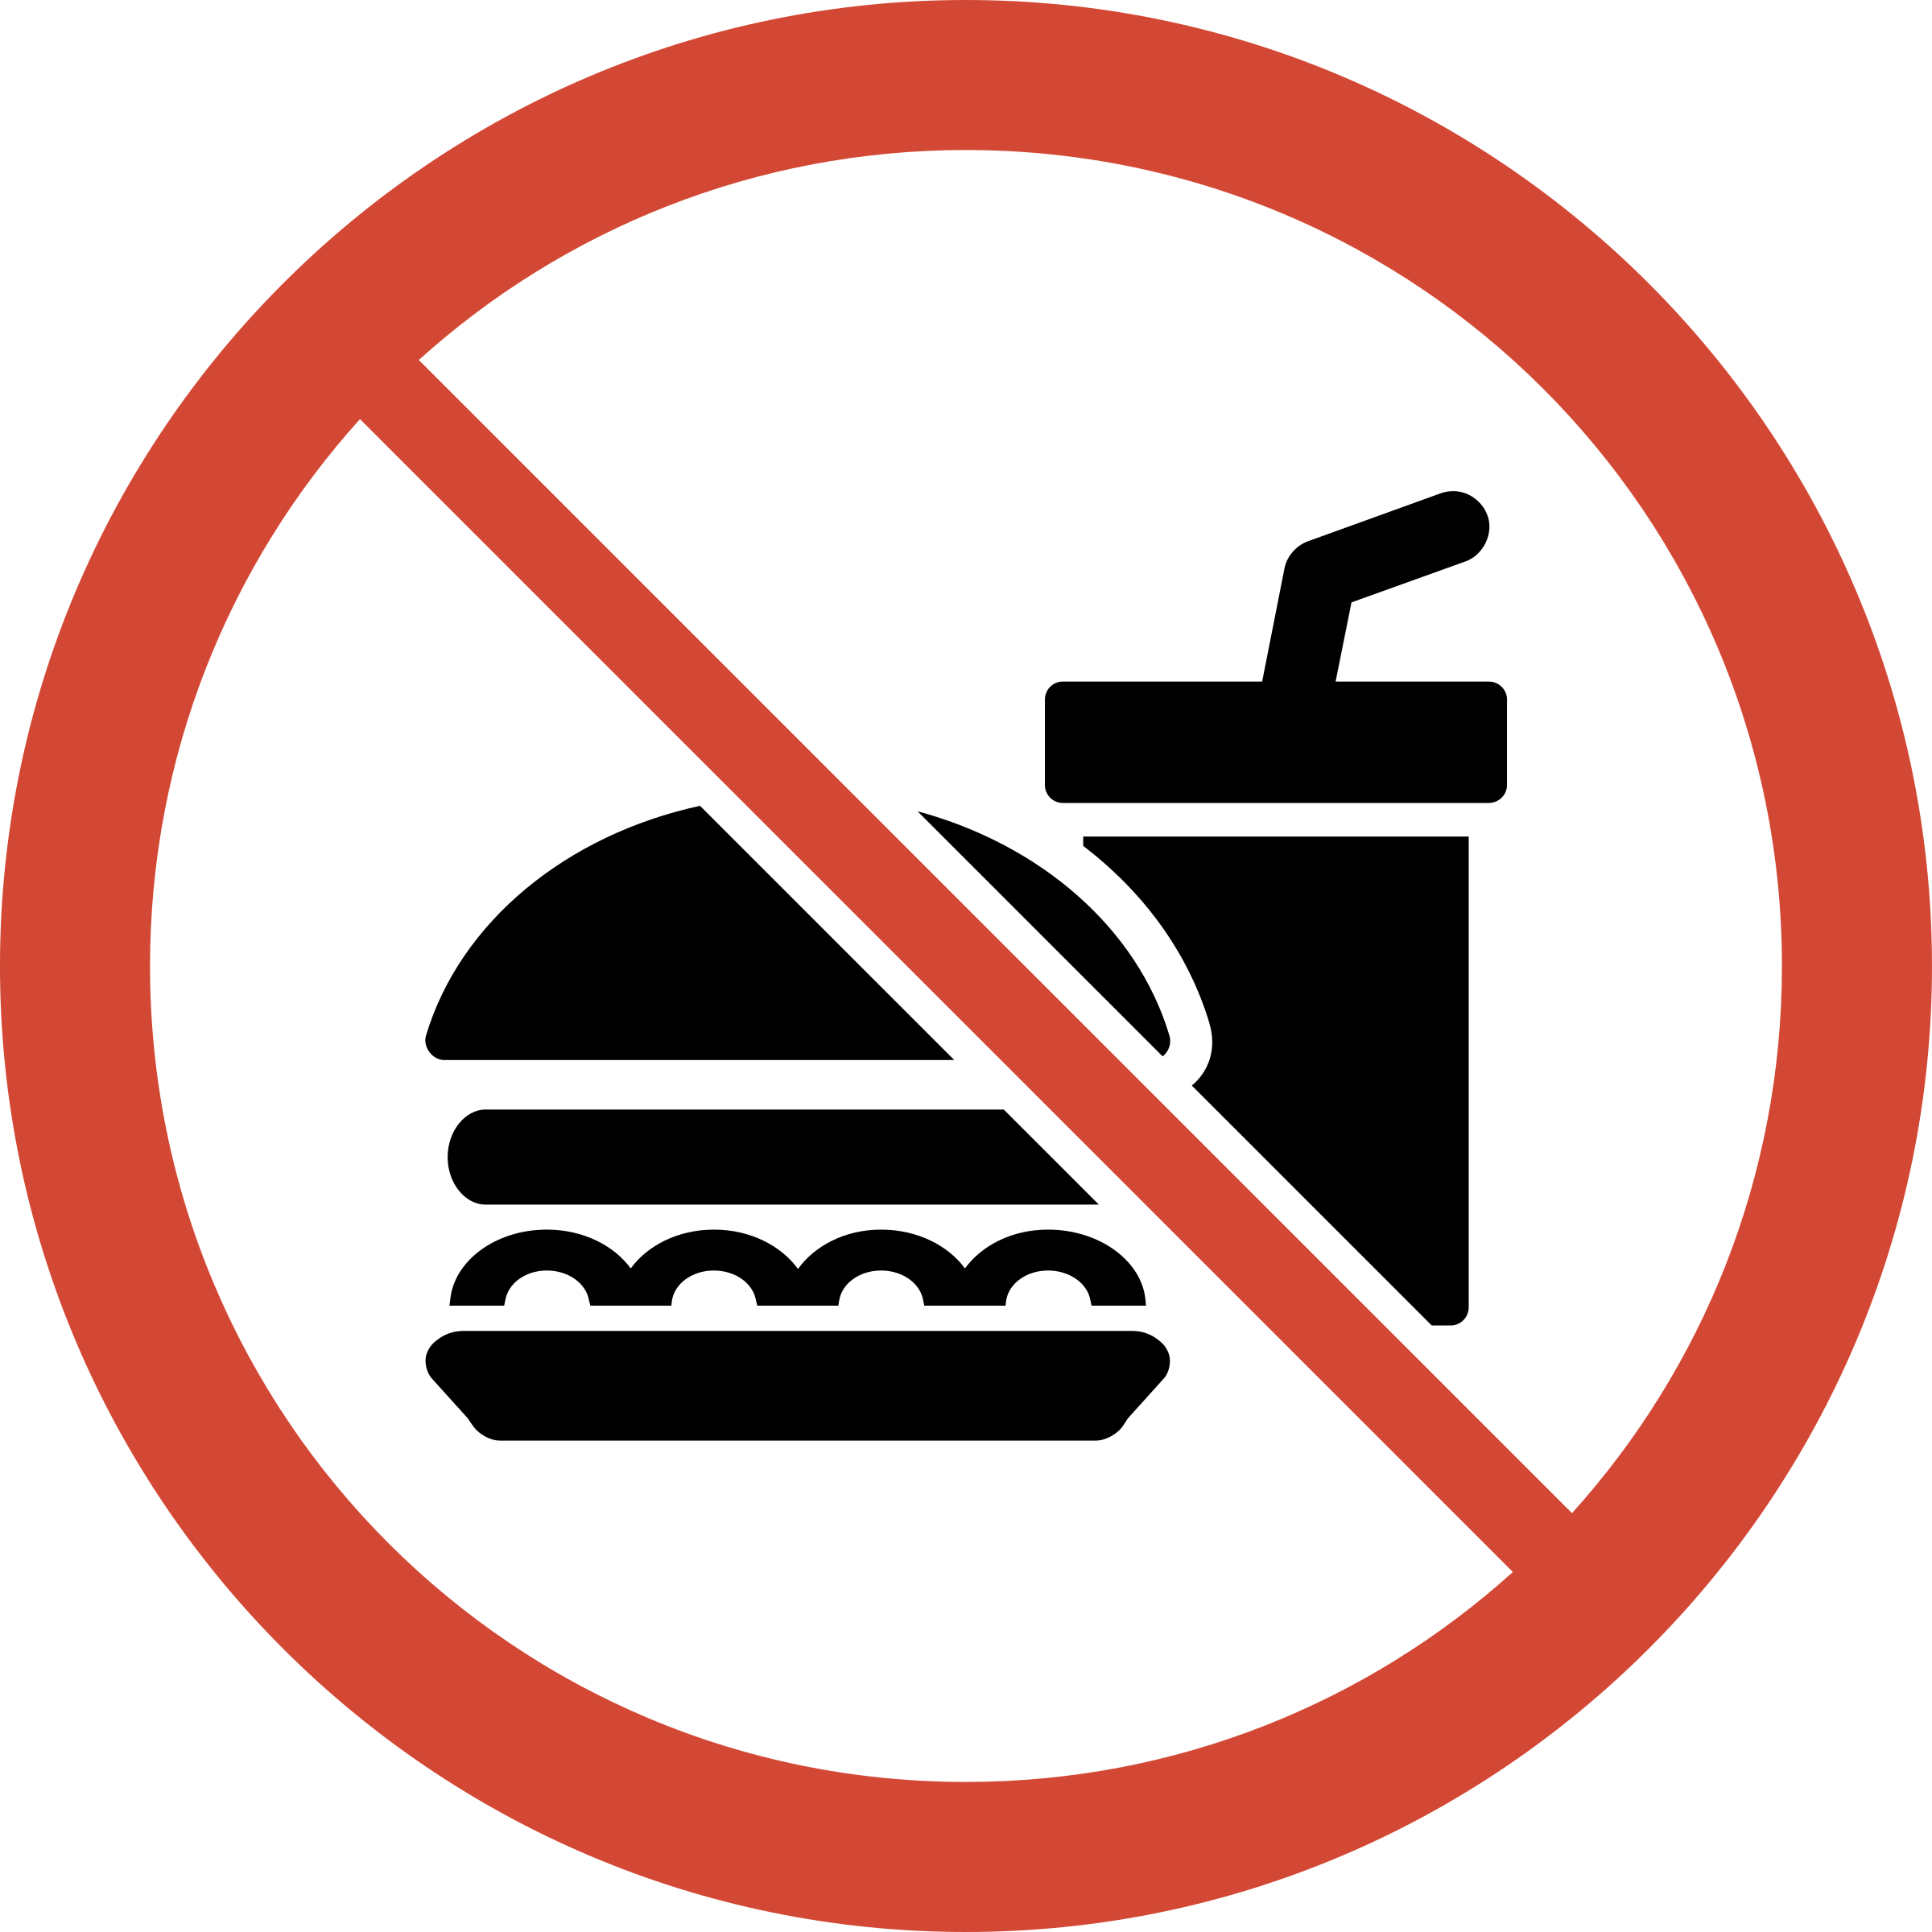 No Food Or Drinks Clipart ...-No food or drinks clipart ...-10